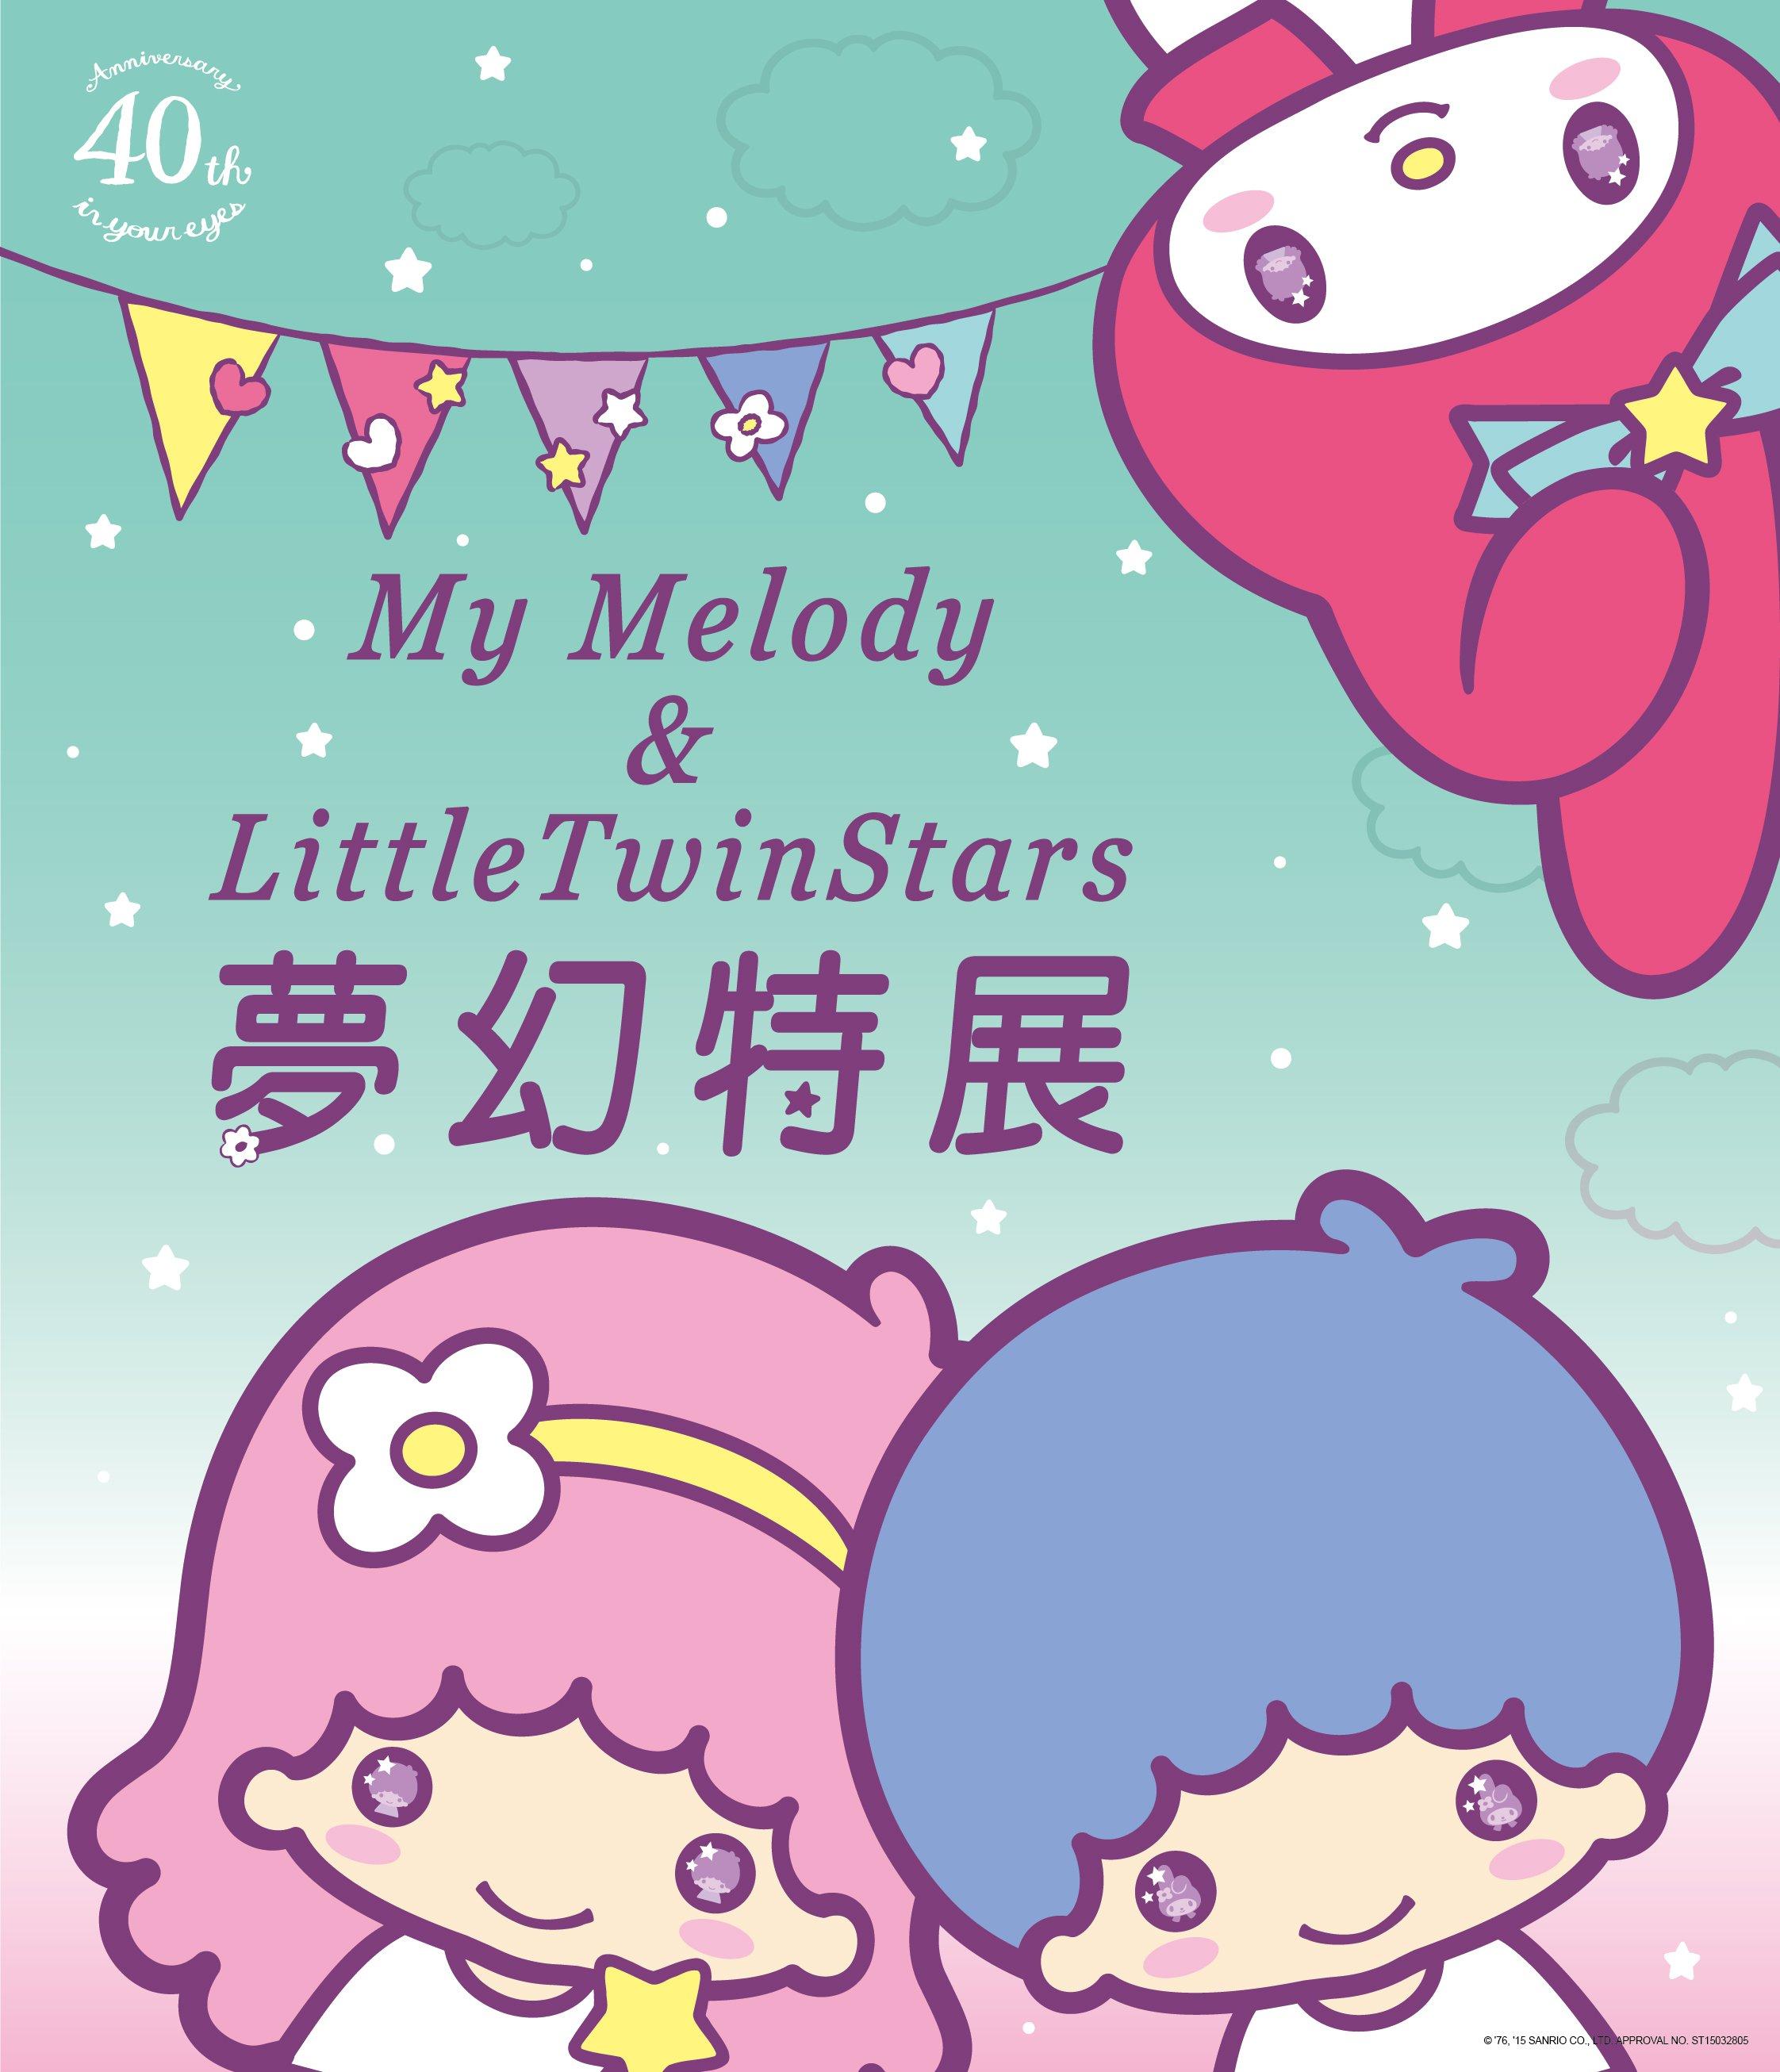 My Melody & Little Twin Stars夢幻特展